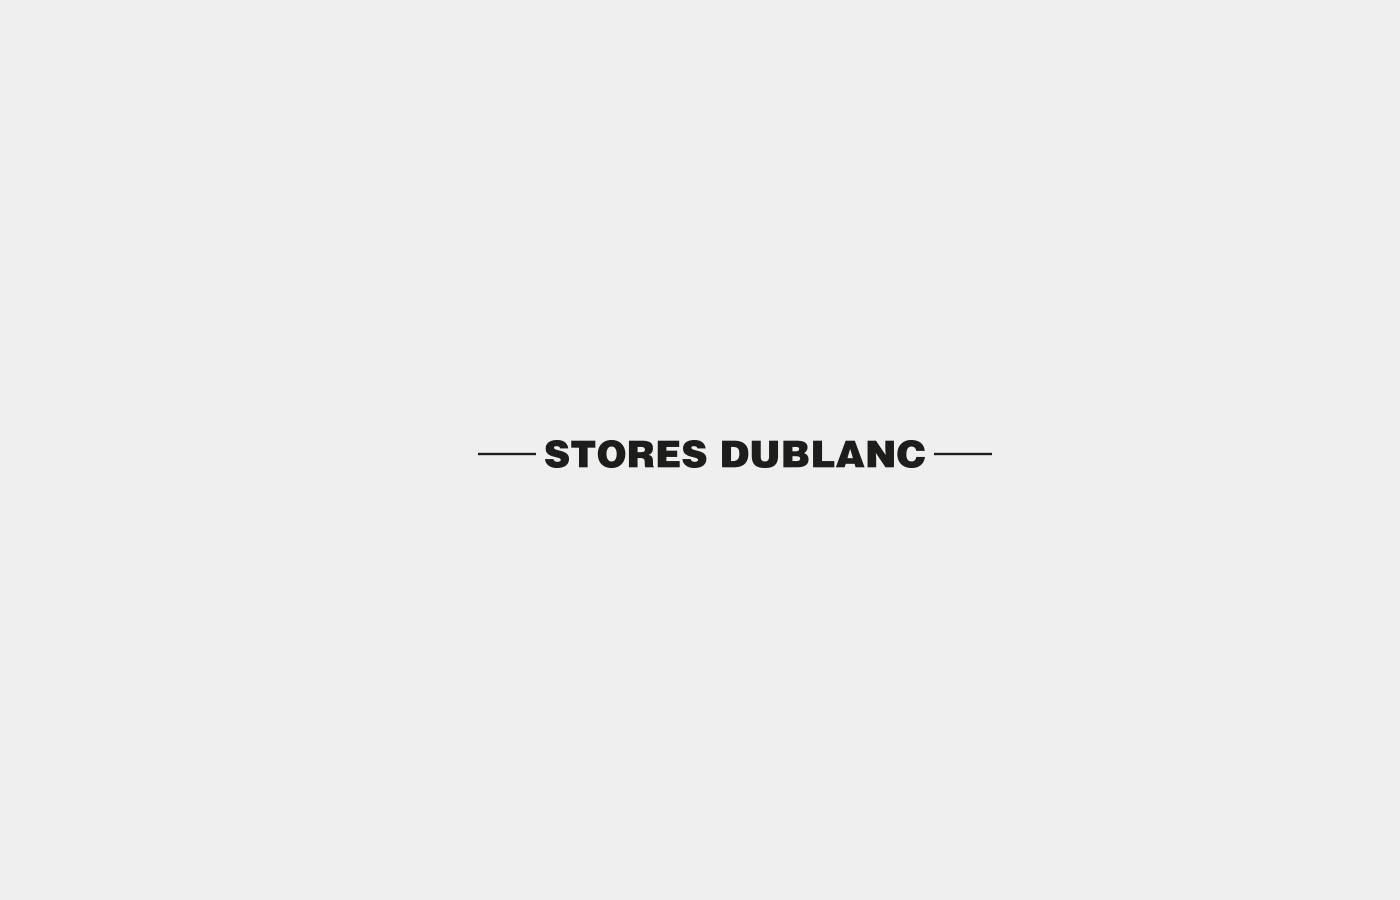 Totem - Enseignes et signalétique - Stores Dublanc